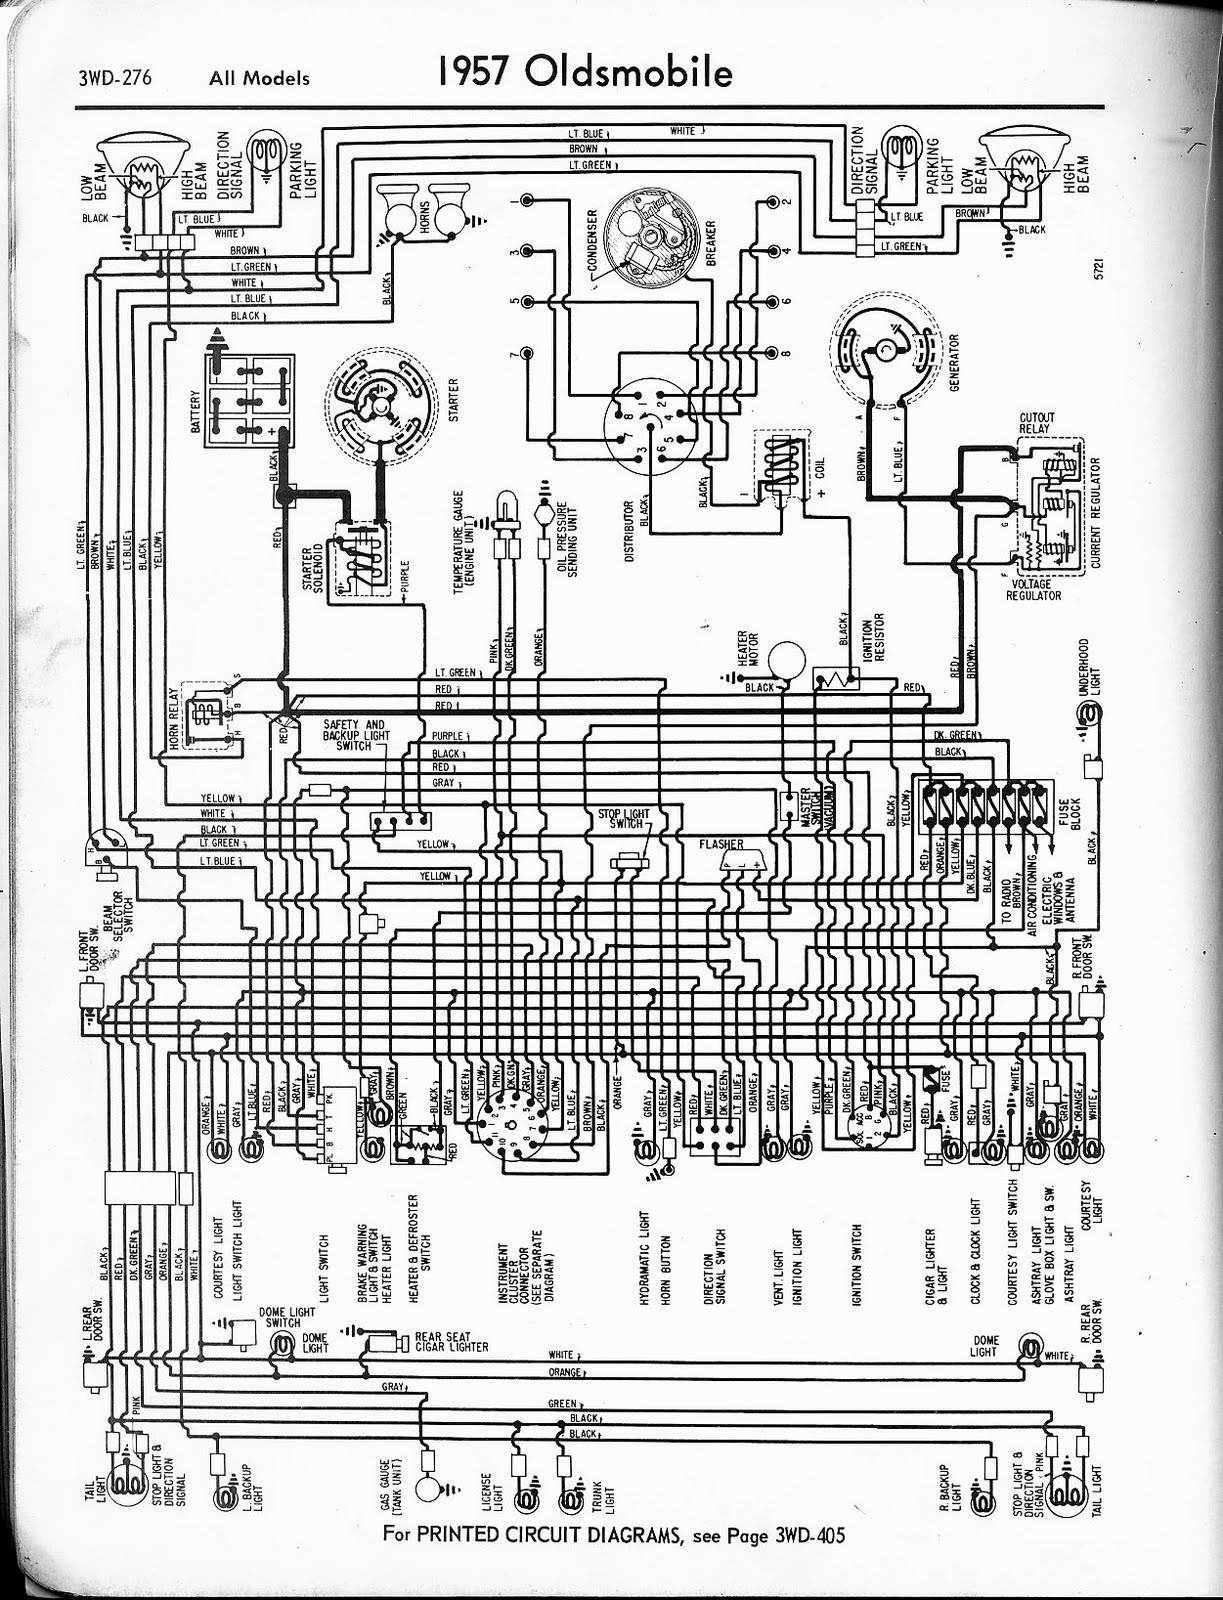 heater wiring diagram for 98 oldsmobile